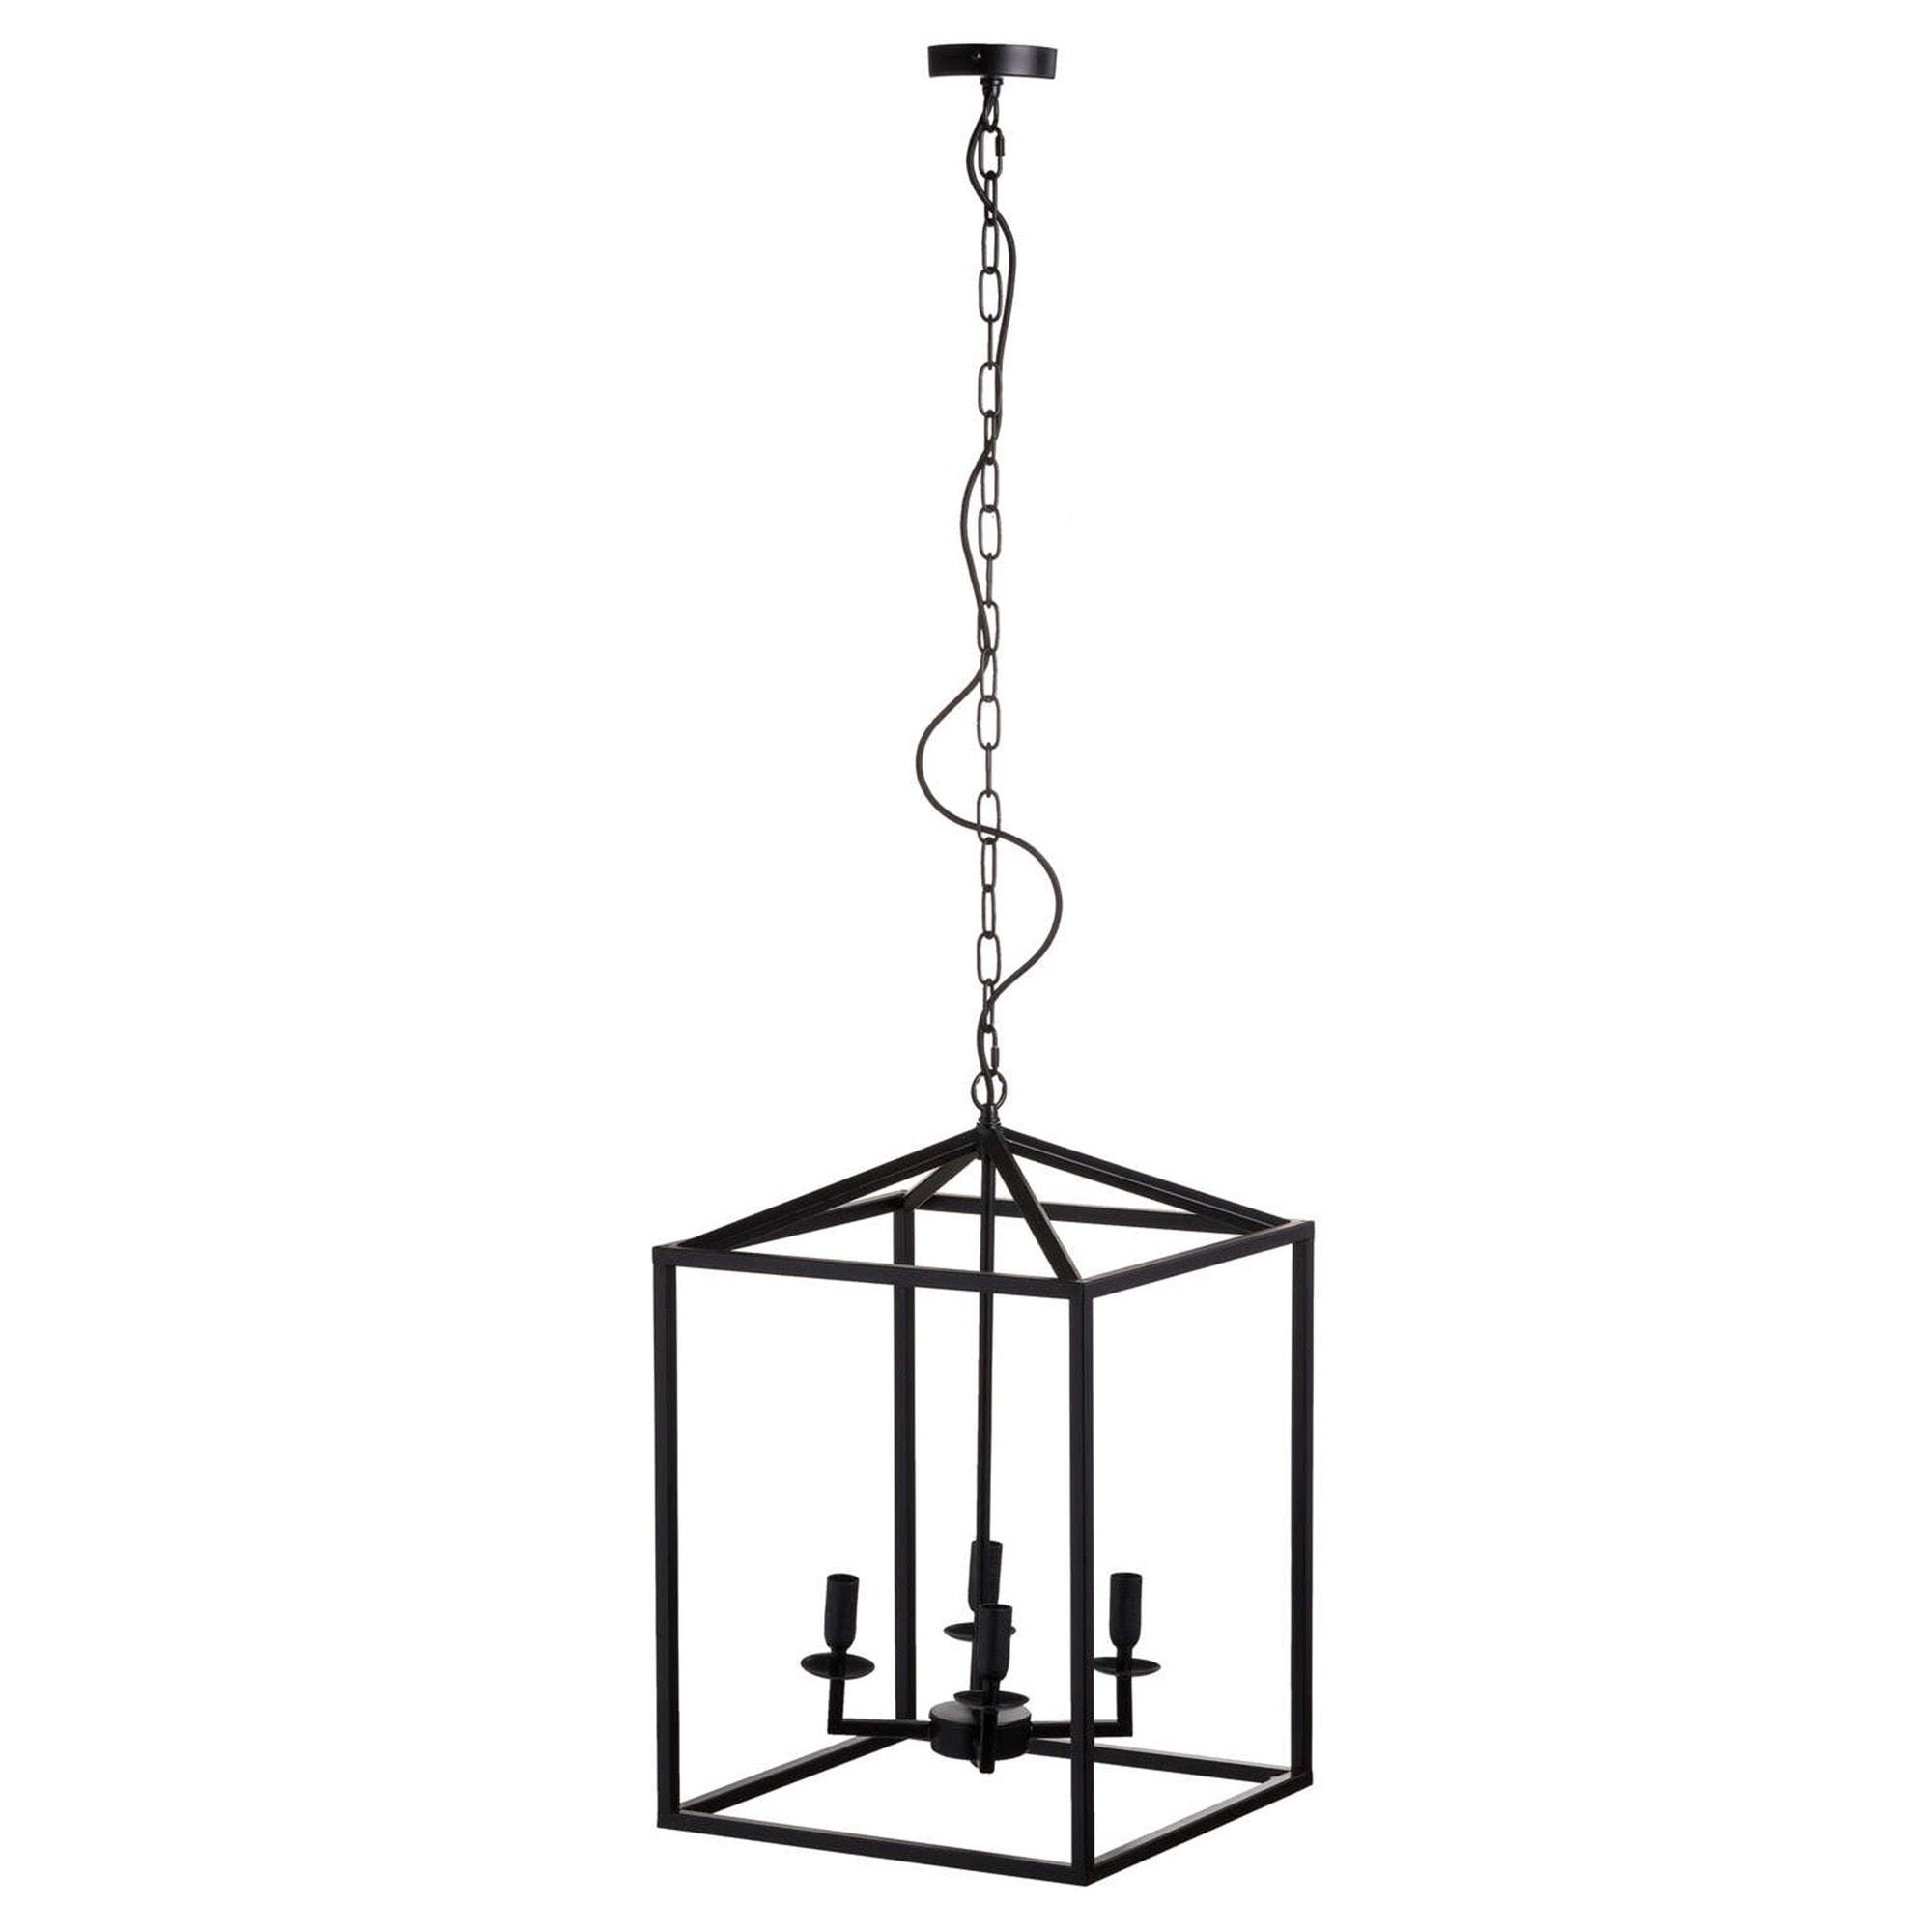 Lantern Hanging Light Contemporary Lighting Pendant Lighting